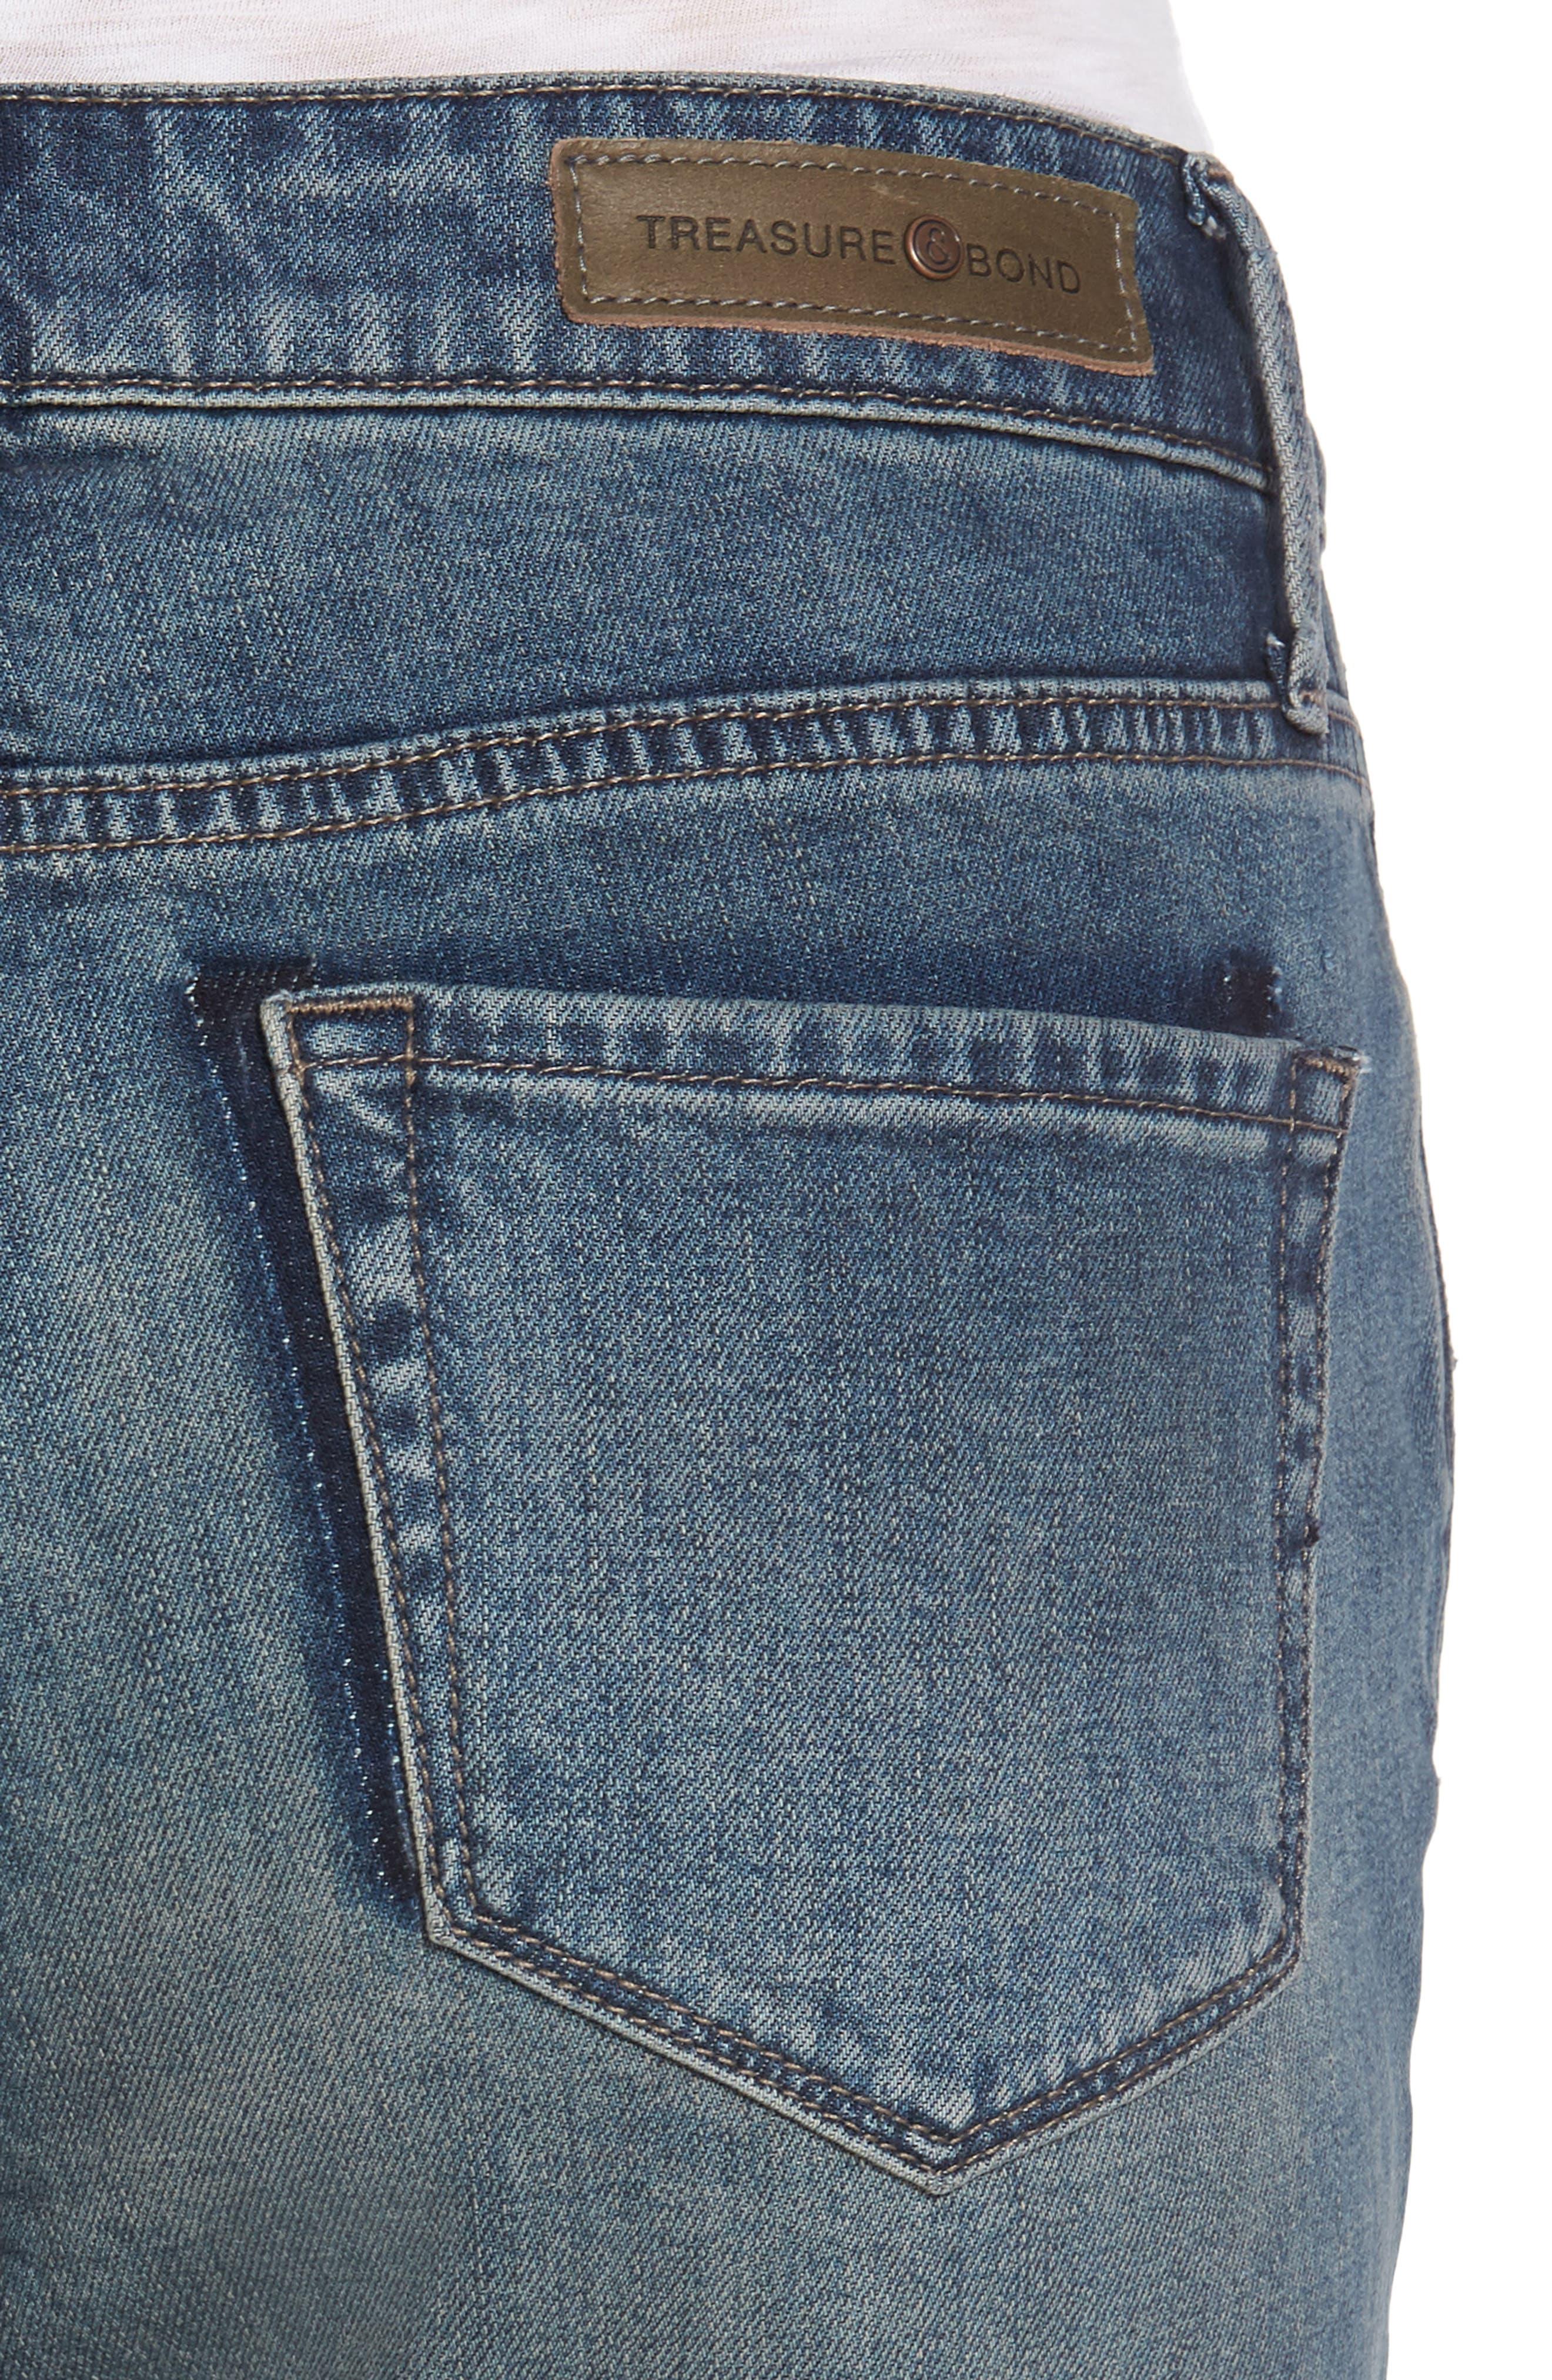 High Waist Skinny Crop Jeans,                             Alternate thumbnail 4, color,                             400